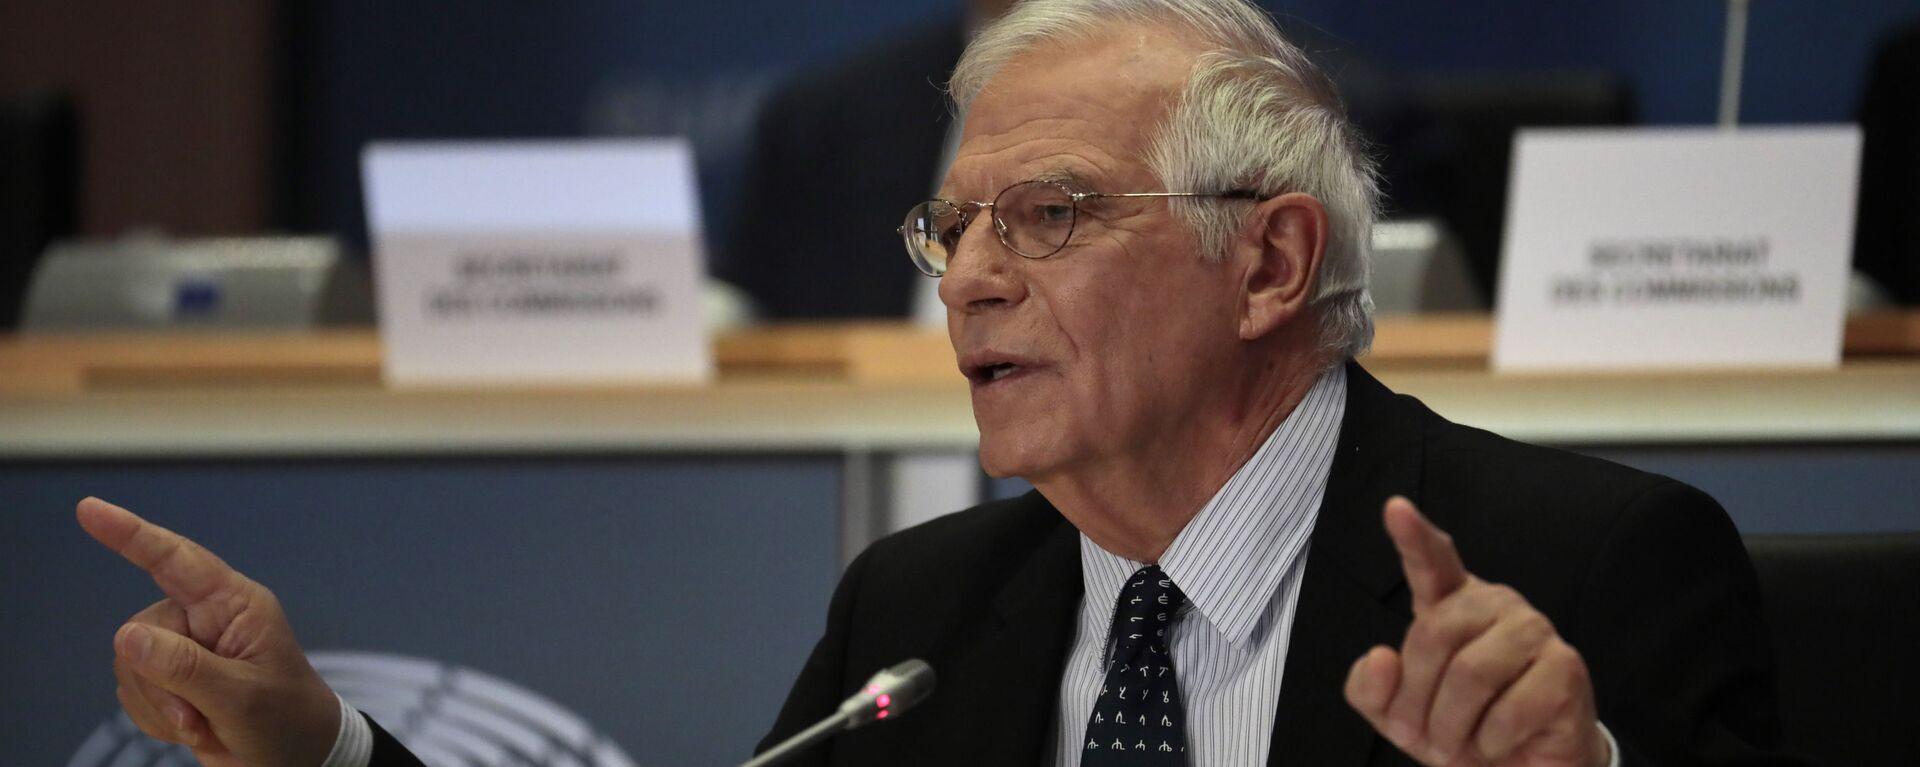 Josep Borrell, el jefe de la diplomacia de la UE - Sputnik Mundo, 1920, 19.08.2021